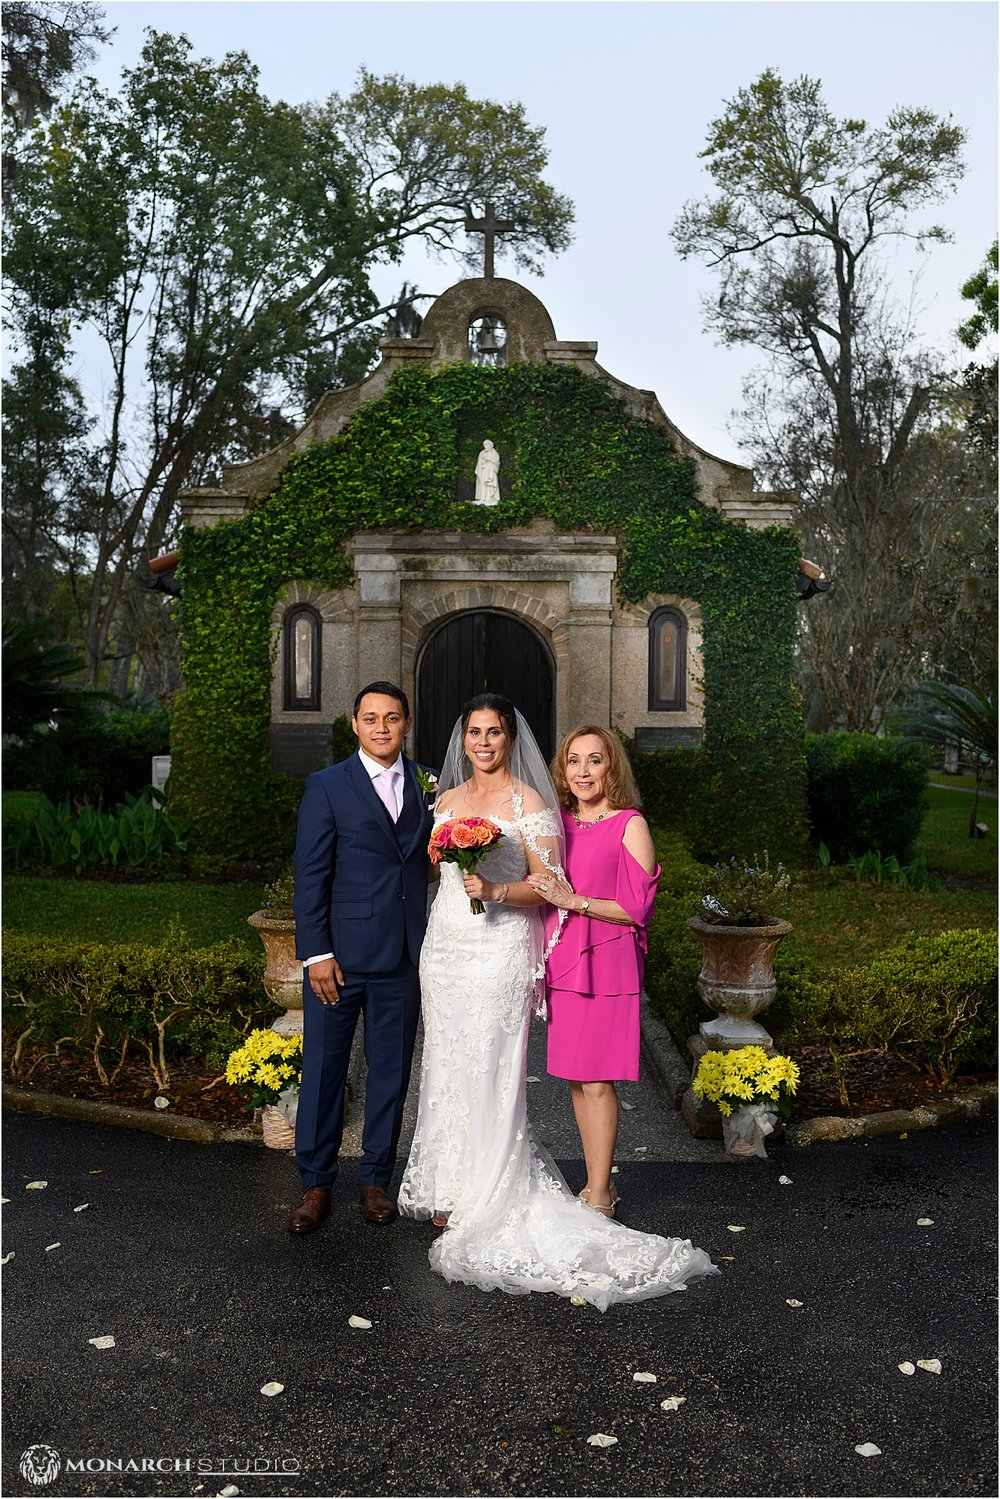 st-augustine-catholic-wedding-064.jpg